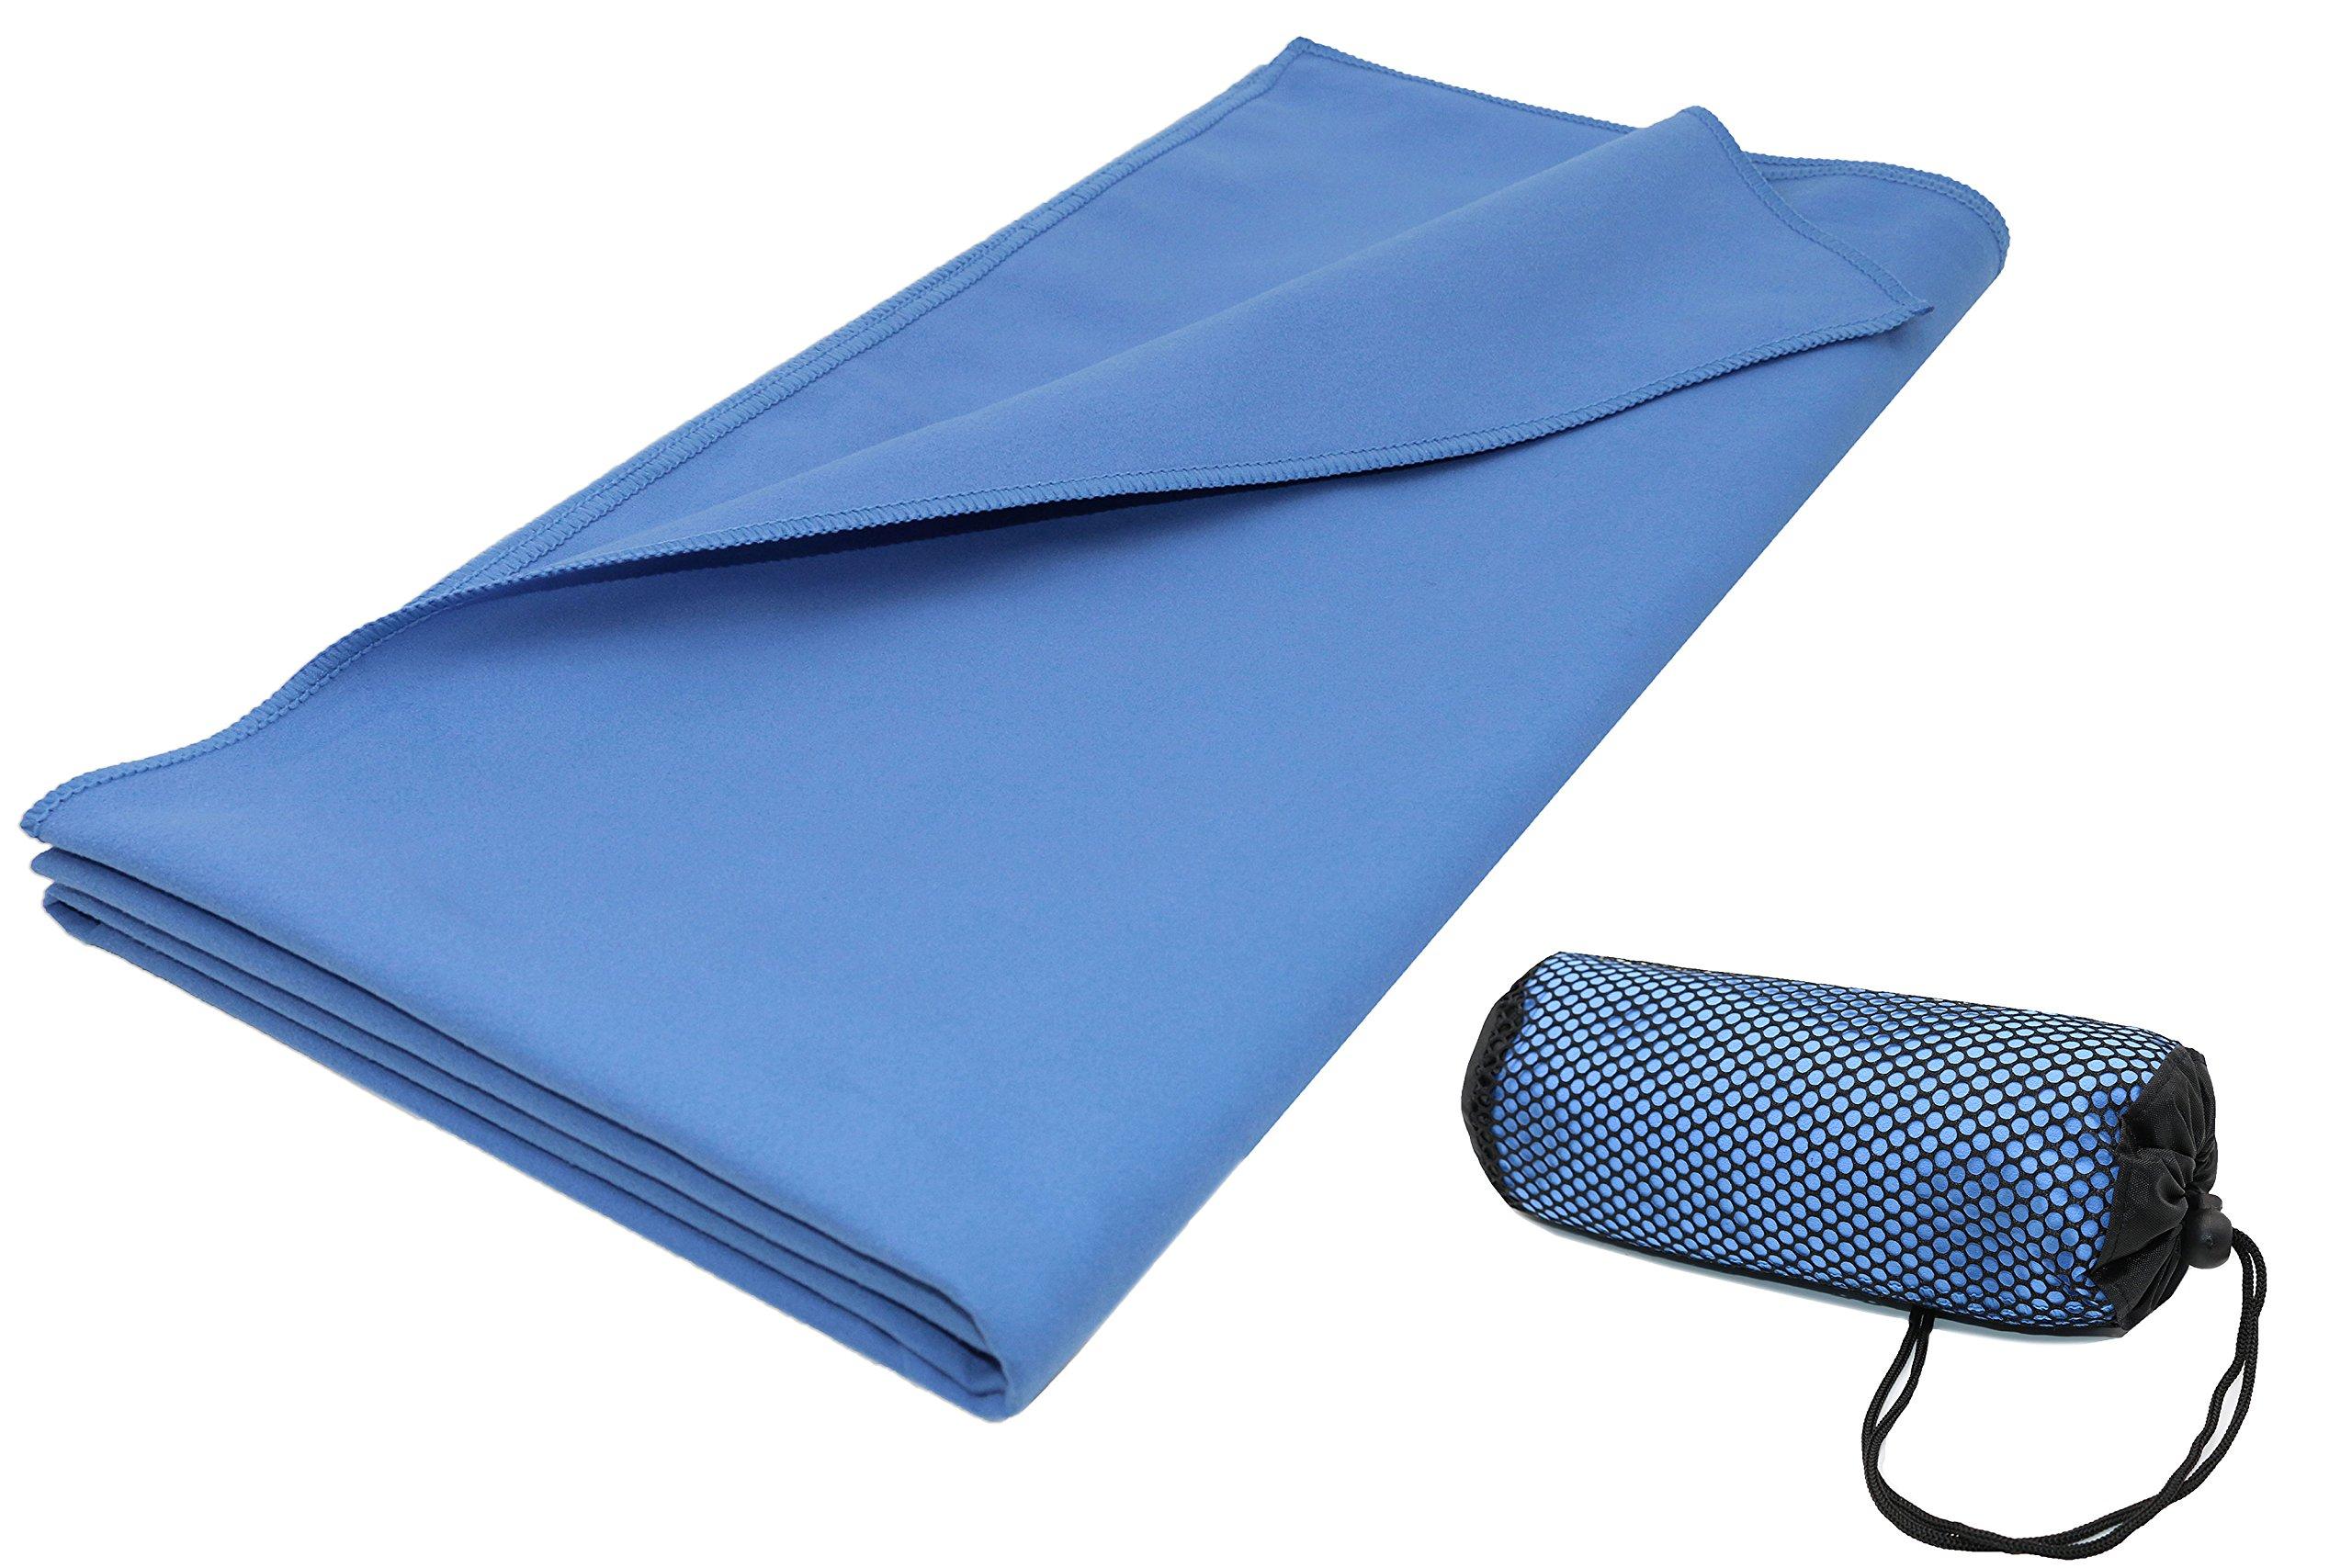 ZOLLNER Toalla de Microfibra Grande 90x180 cm, Azul product image